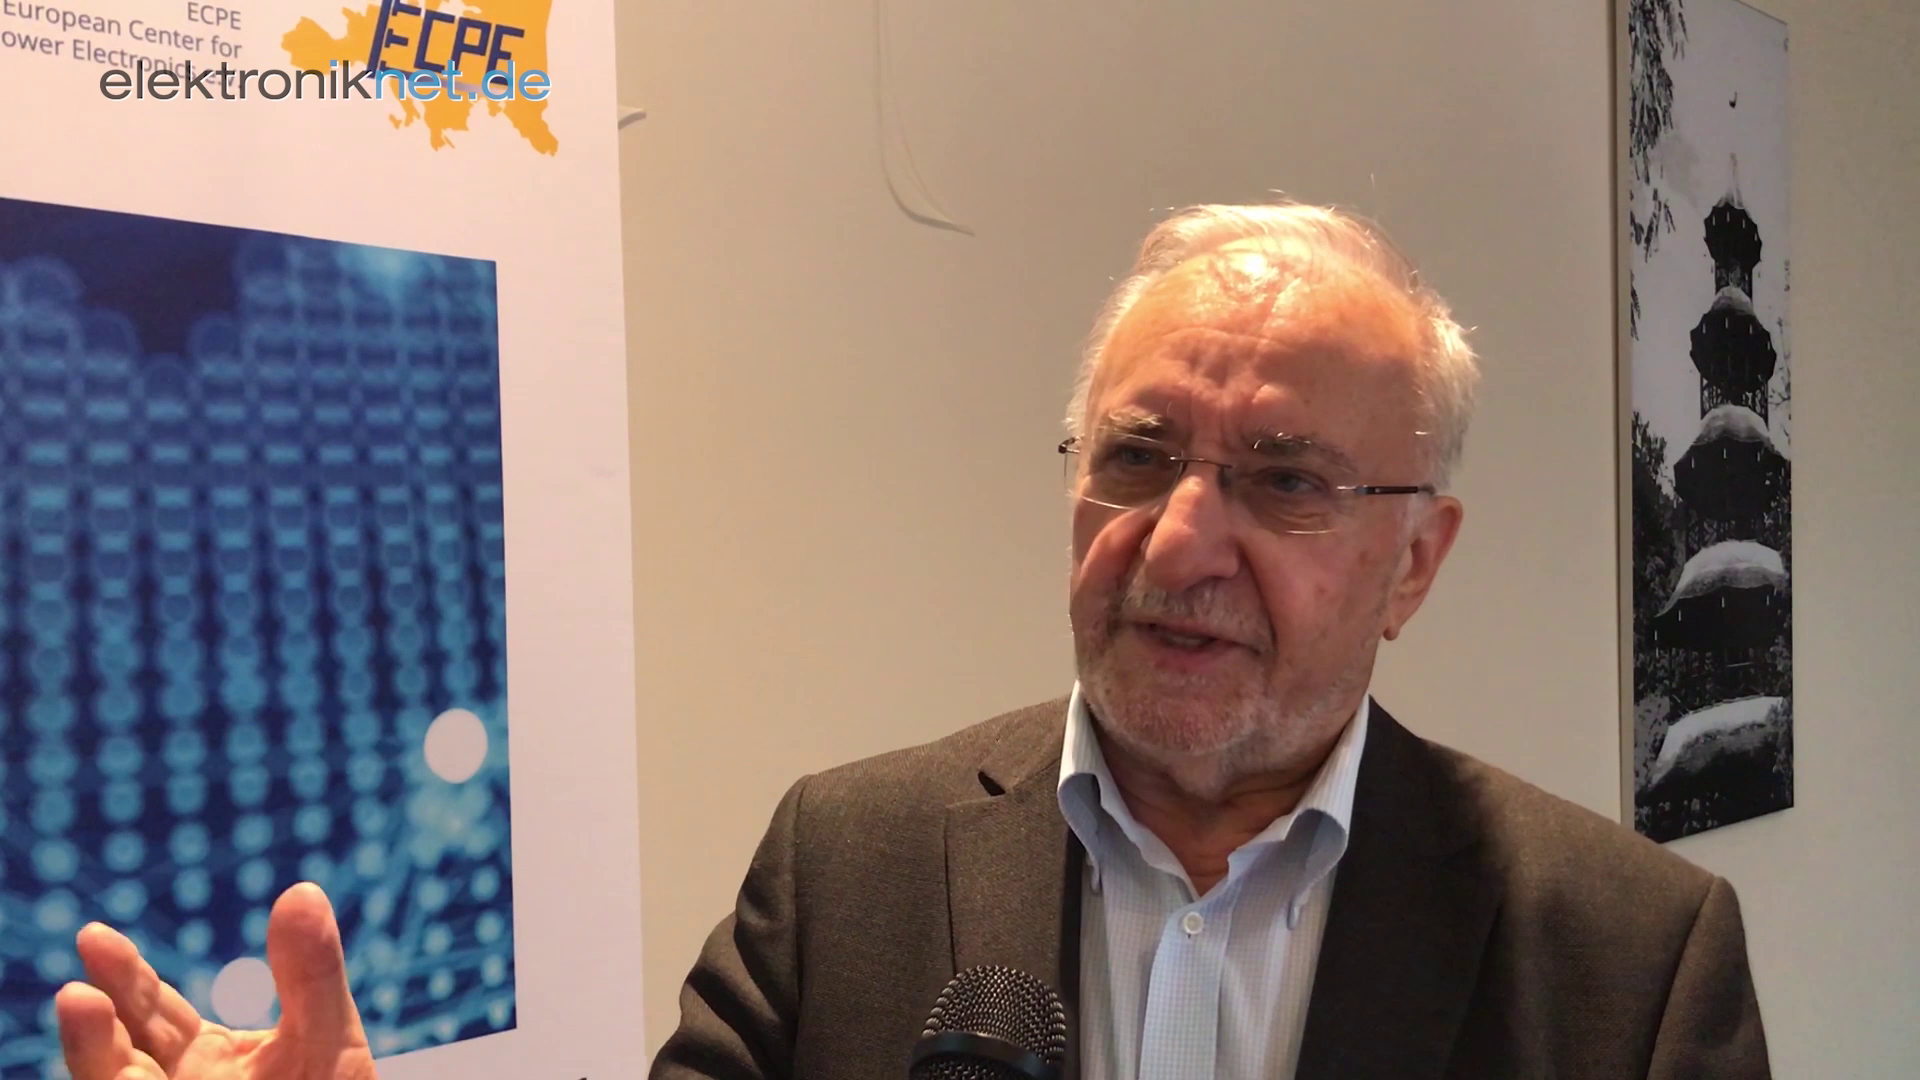 Professor Leo Lorenz, Chairman ECPE